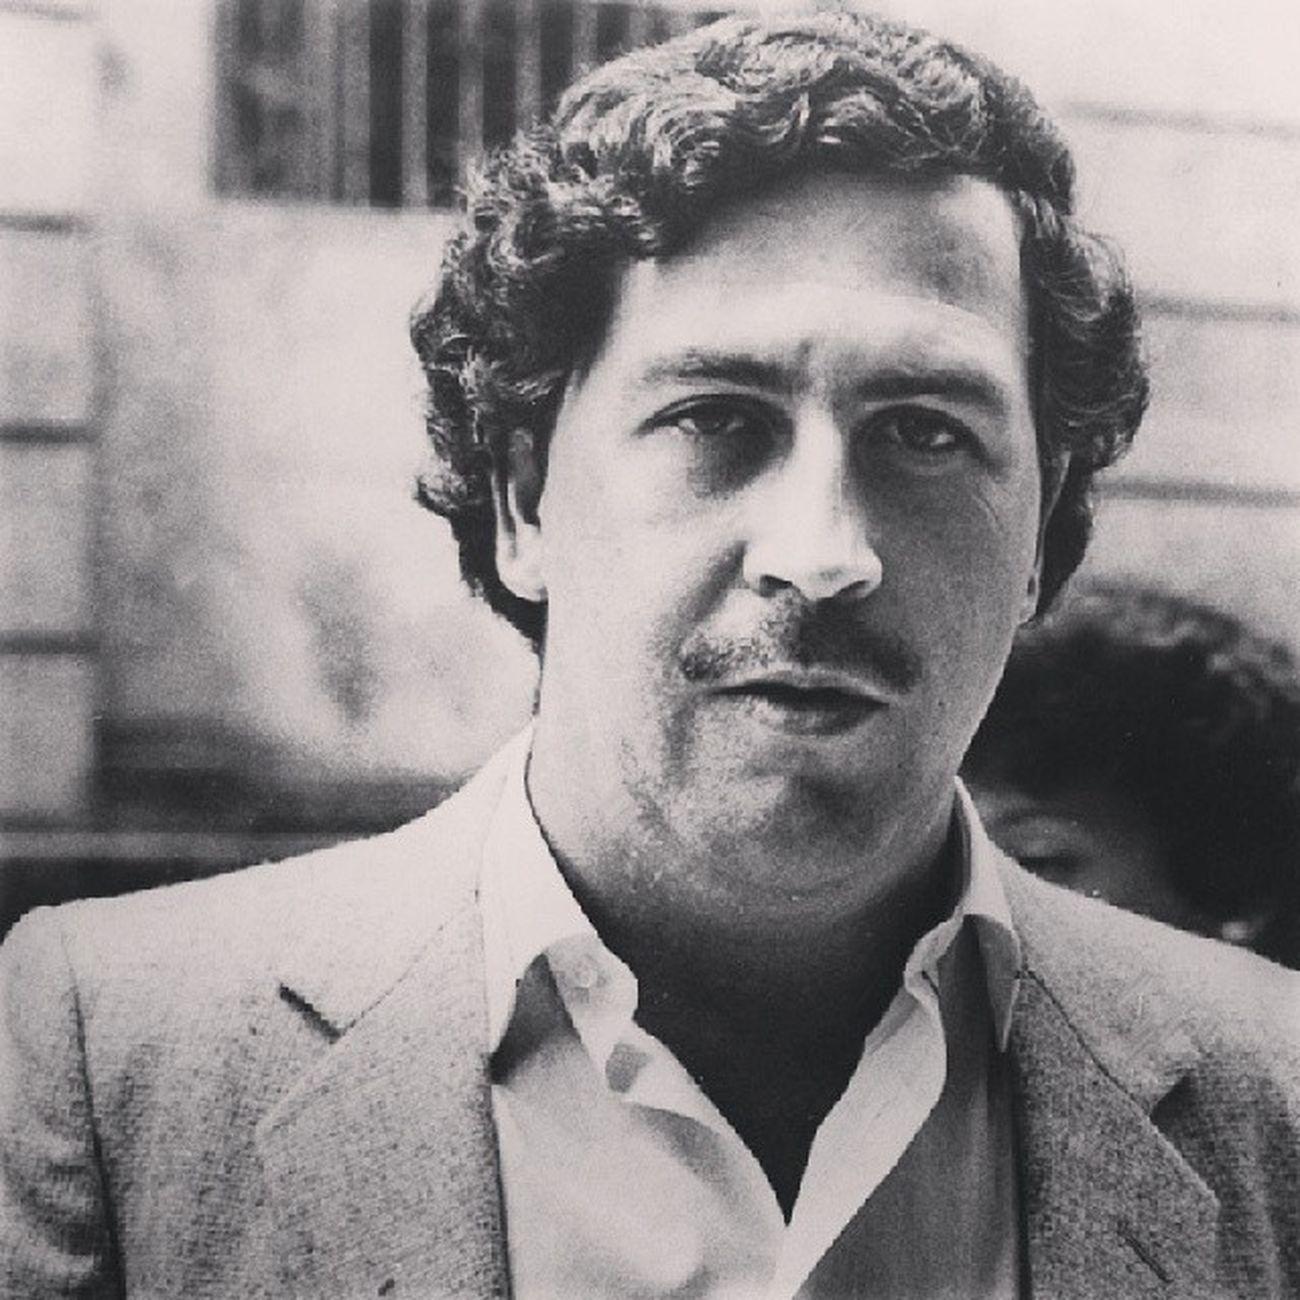 Drug lord. Escobar